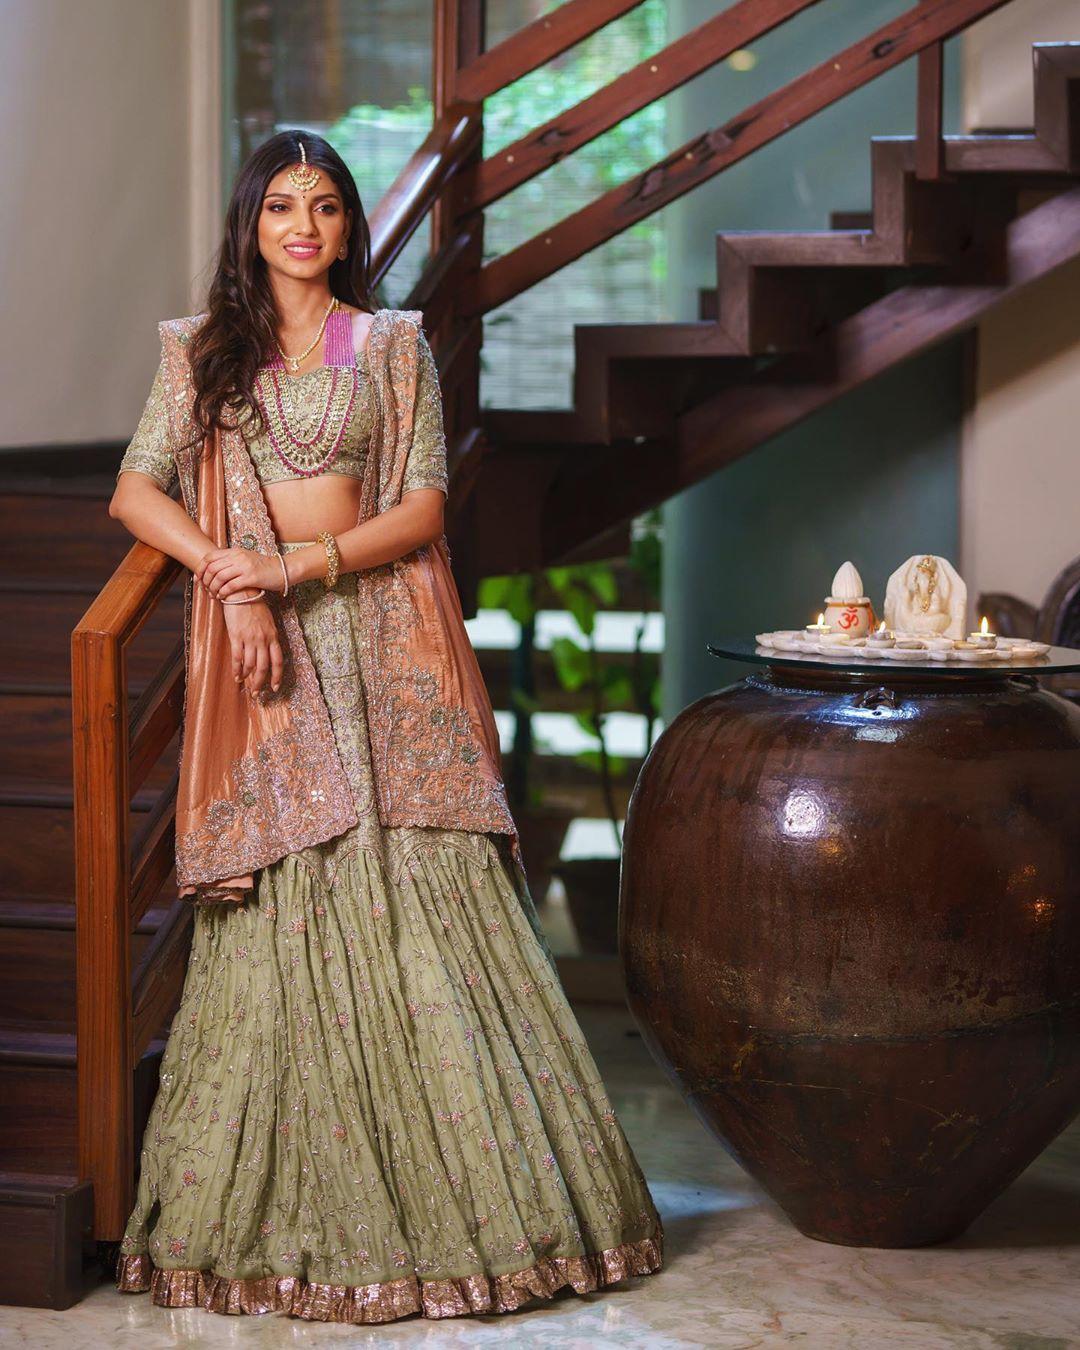 Miheeka Bajaj Rana Daggubati Pre wedding Shoot